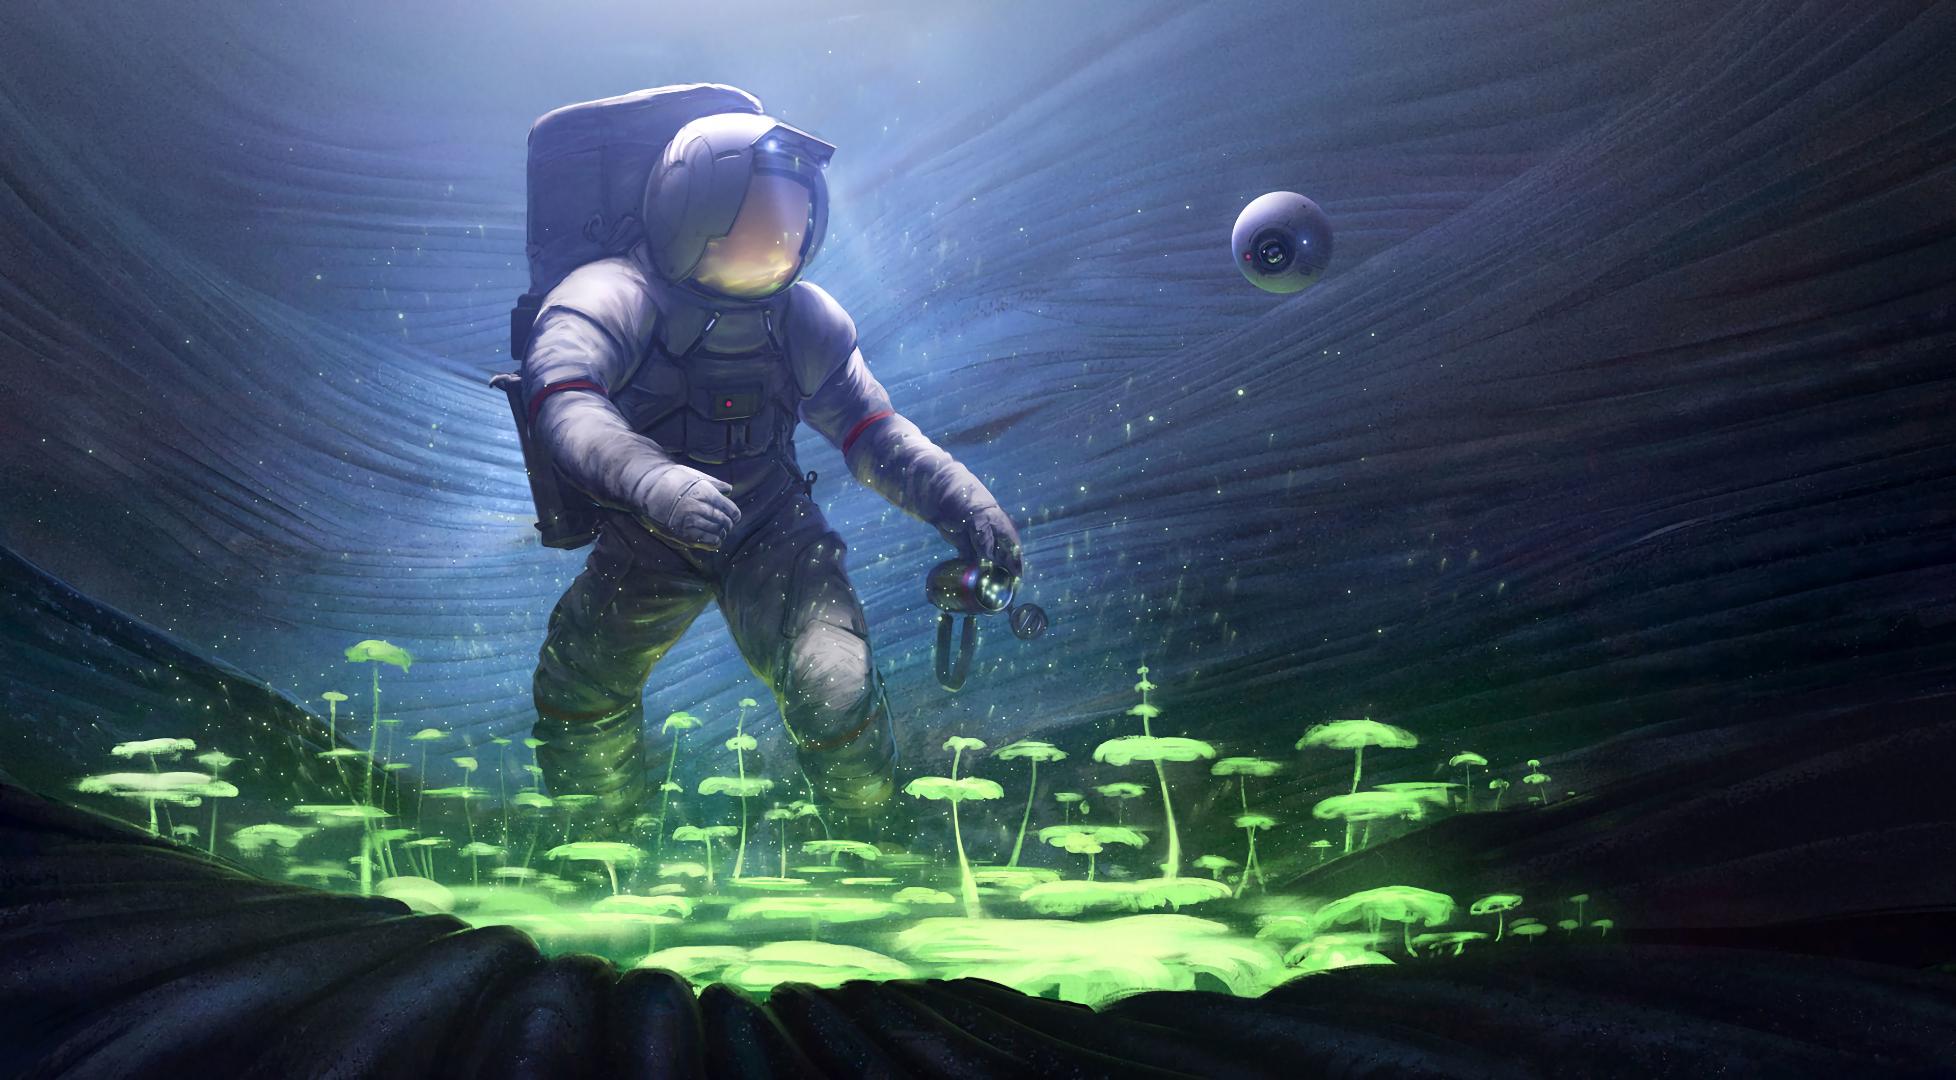 Sci Fi Astronaut 1956x1080